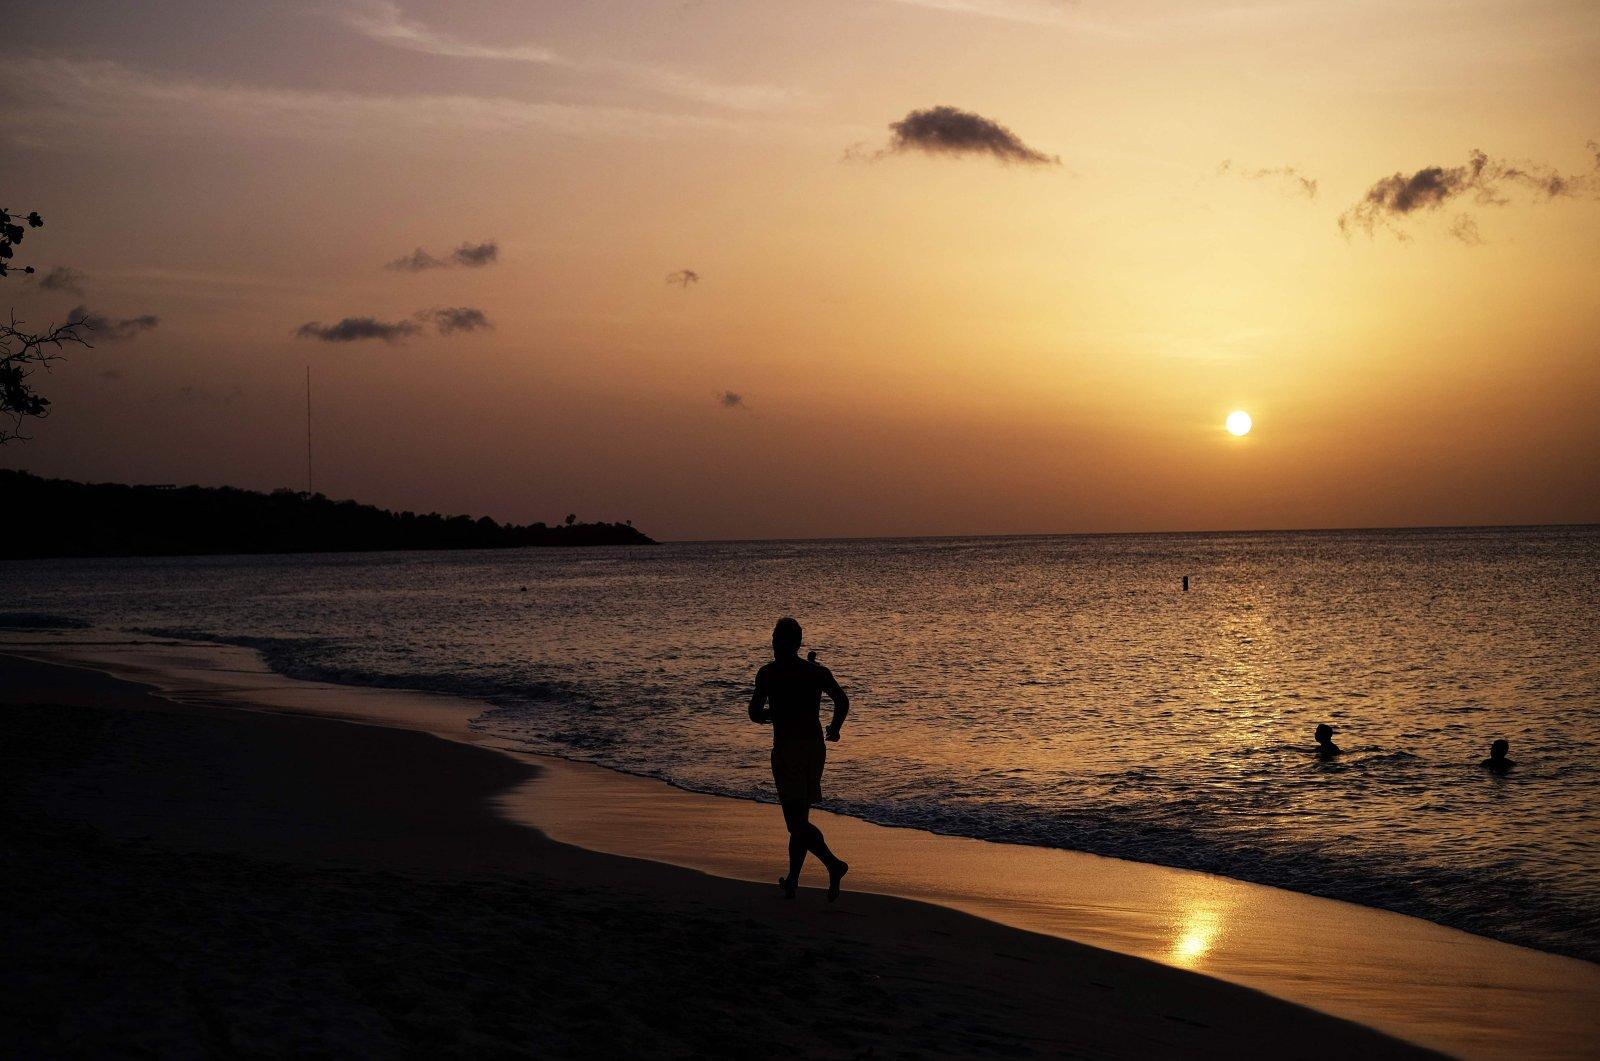 A man jogs along a beach in Saint George's, Grenada, on April 20, 2015. (AFP Photo)